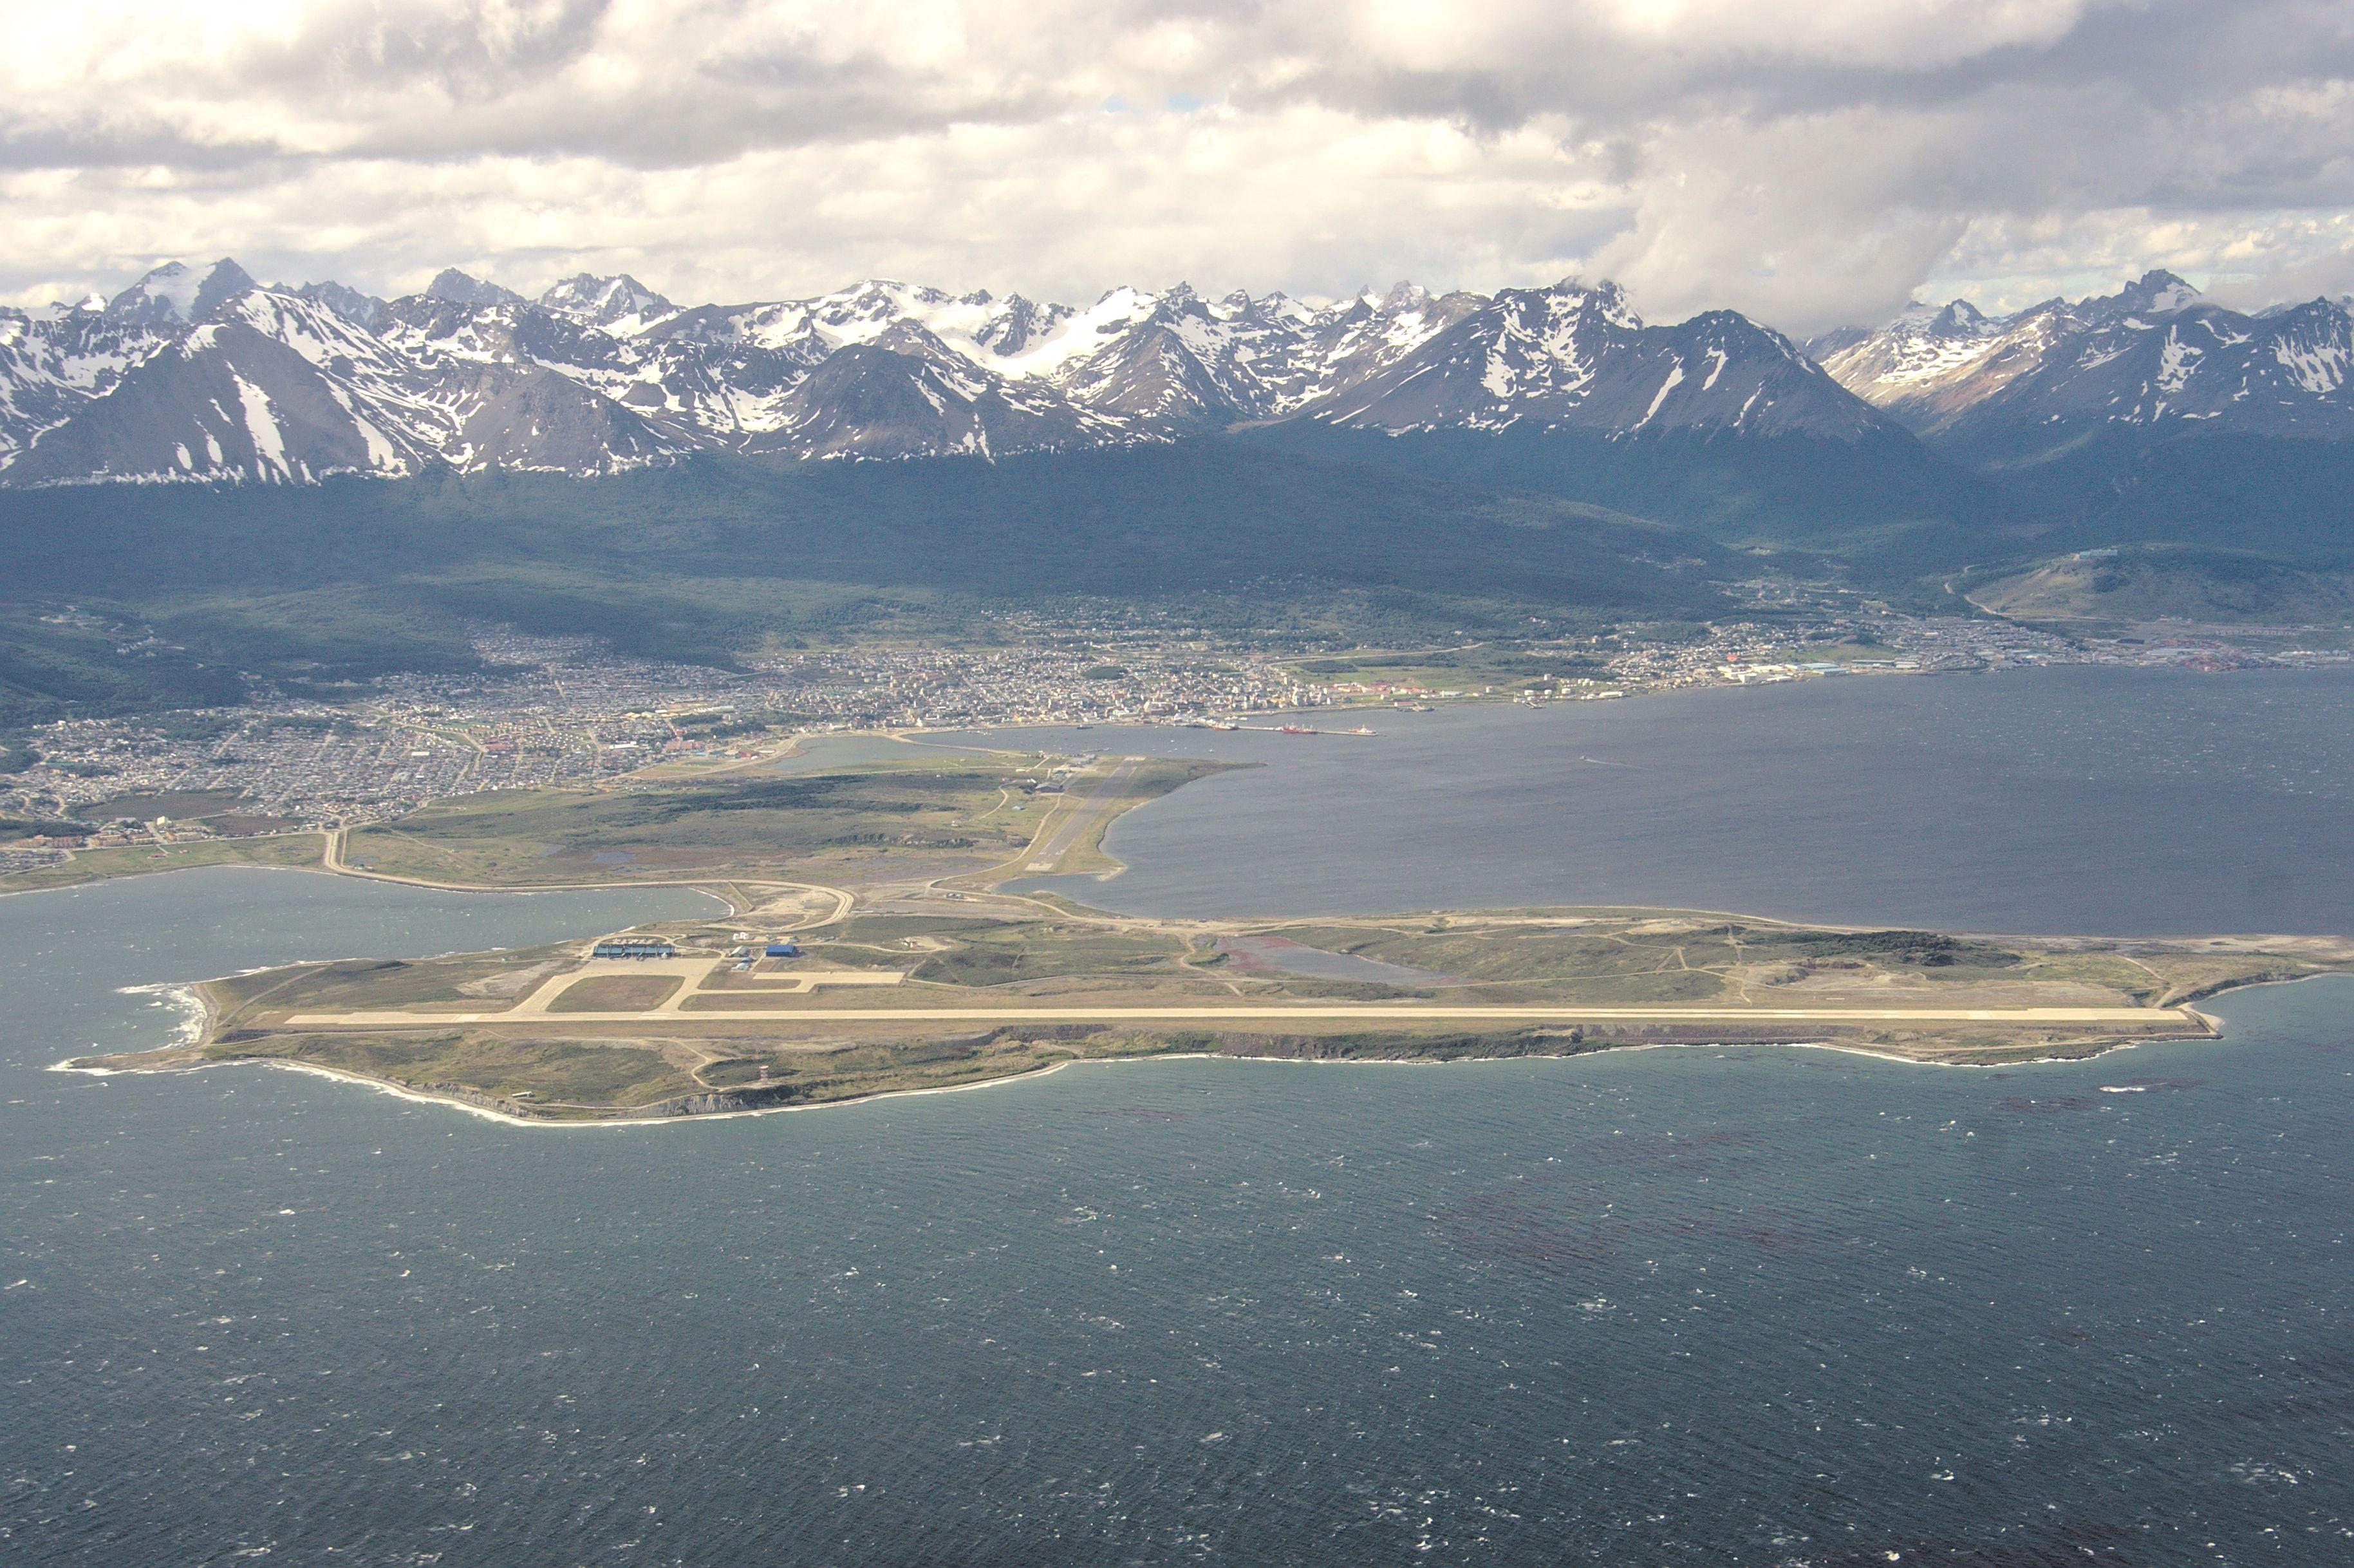 Ushuaia, Ciudad de ushuaia, Malvinas argentinas